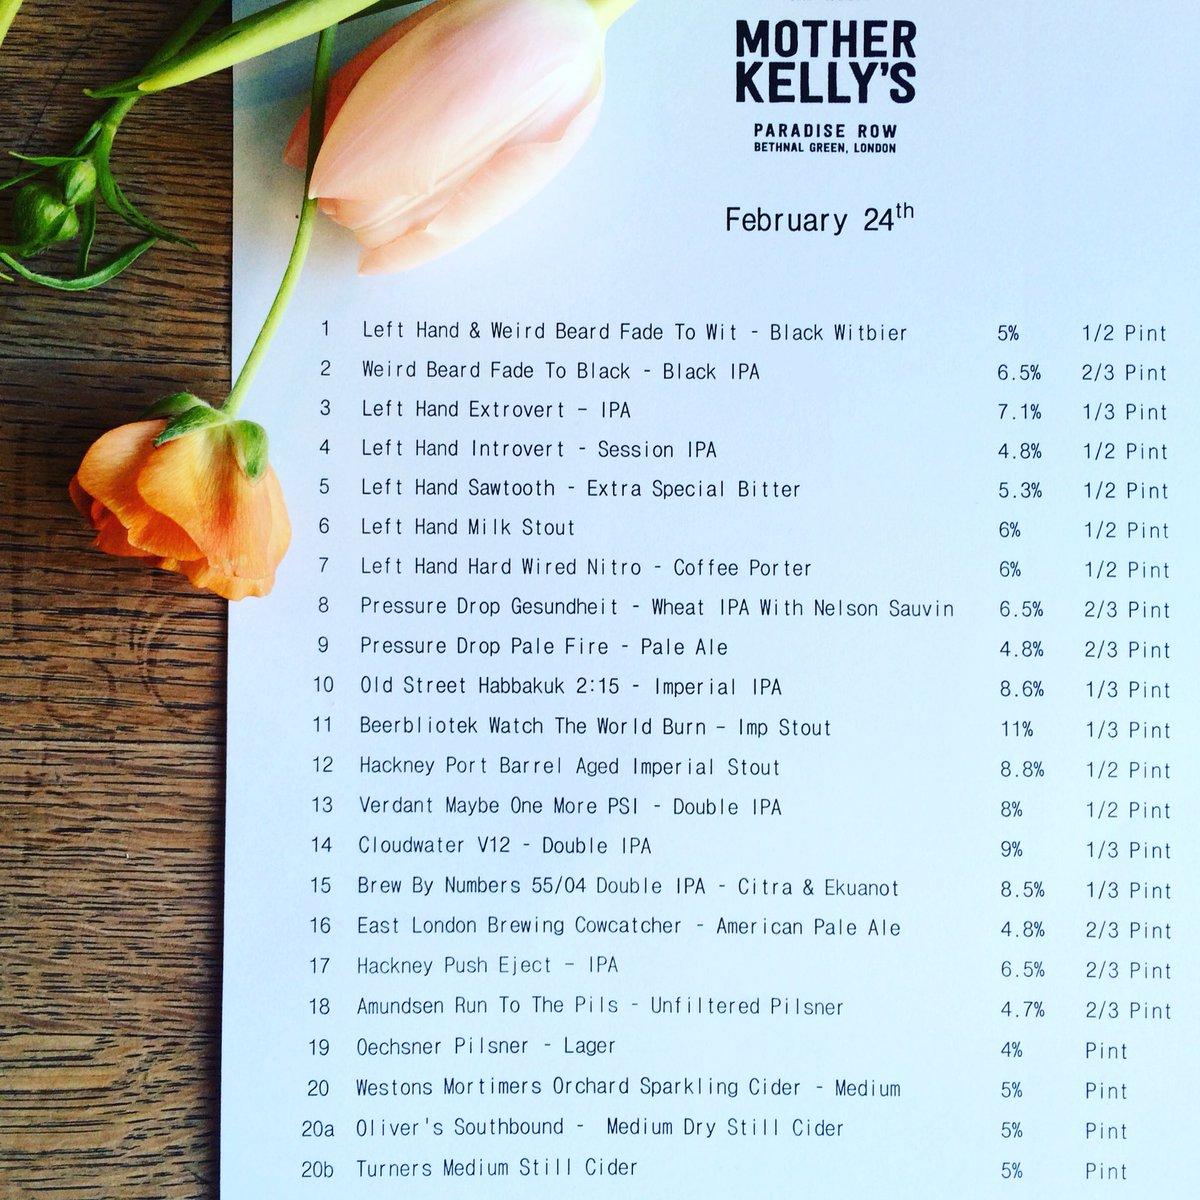 FRIDAY&#39;S MENU IS LOVING AND GIVING   #menu #beermenu #friday #friyay #eastlondon #bethnalgreen #E2 #motherkellys<br>http://pic.twitter.com/PFTl4AgKV4